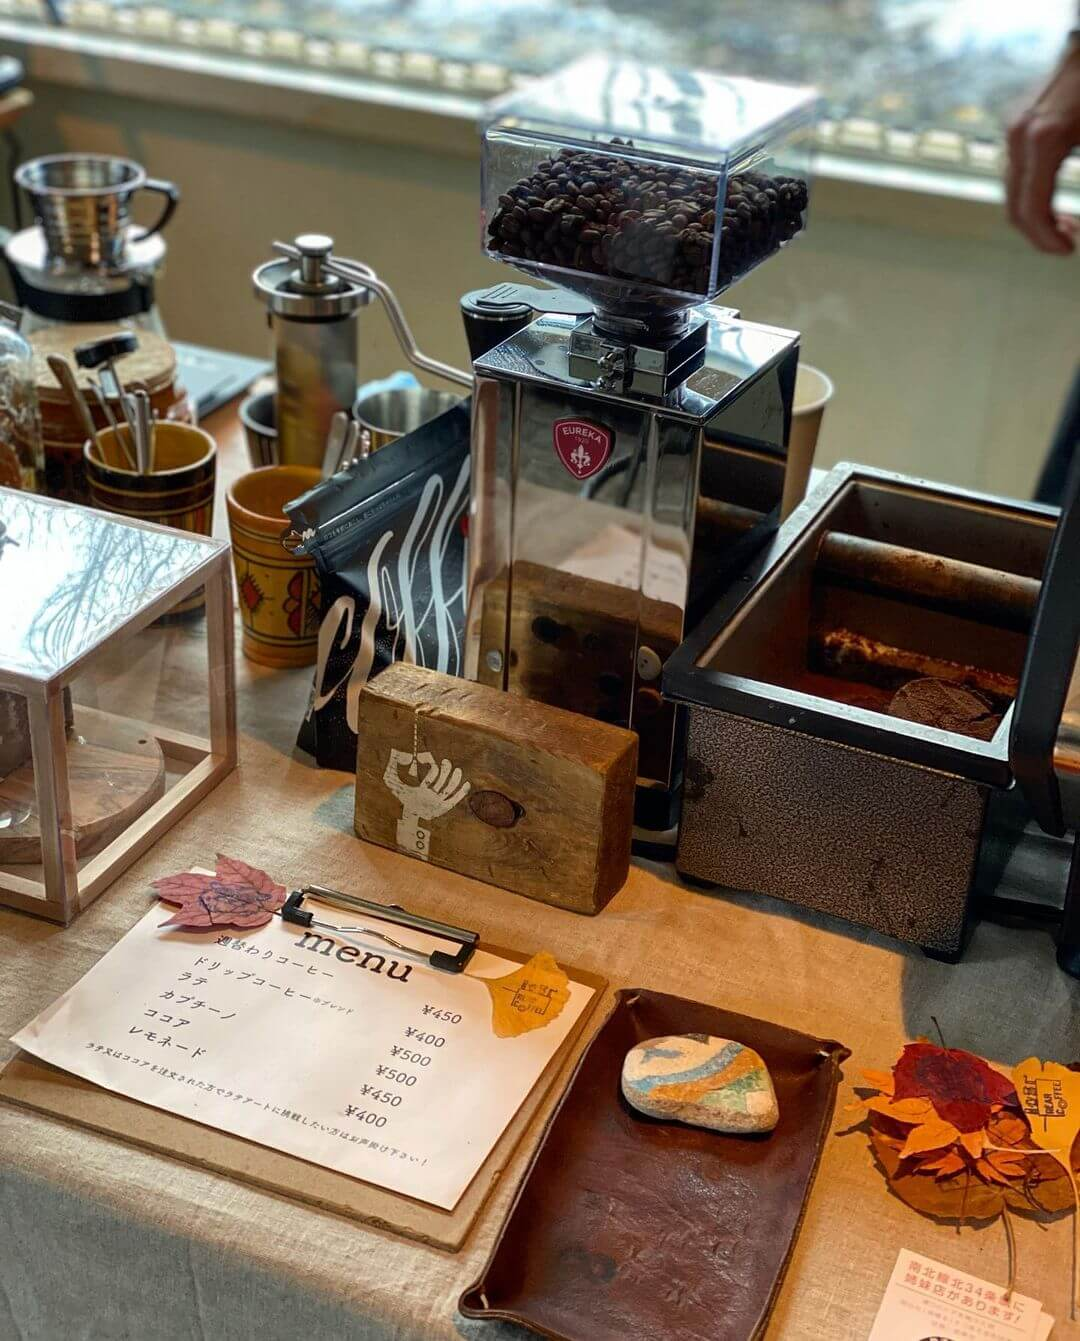 Rear coffee(リアコーヒー)のメニュー